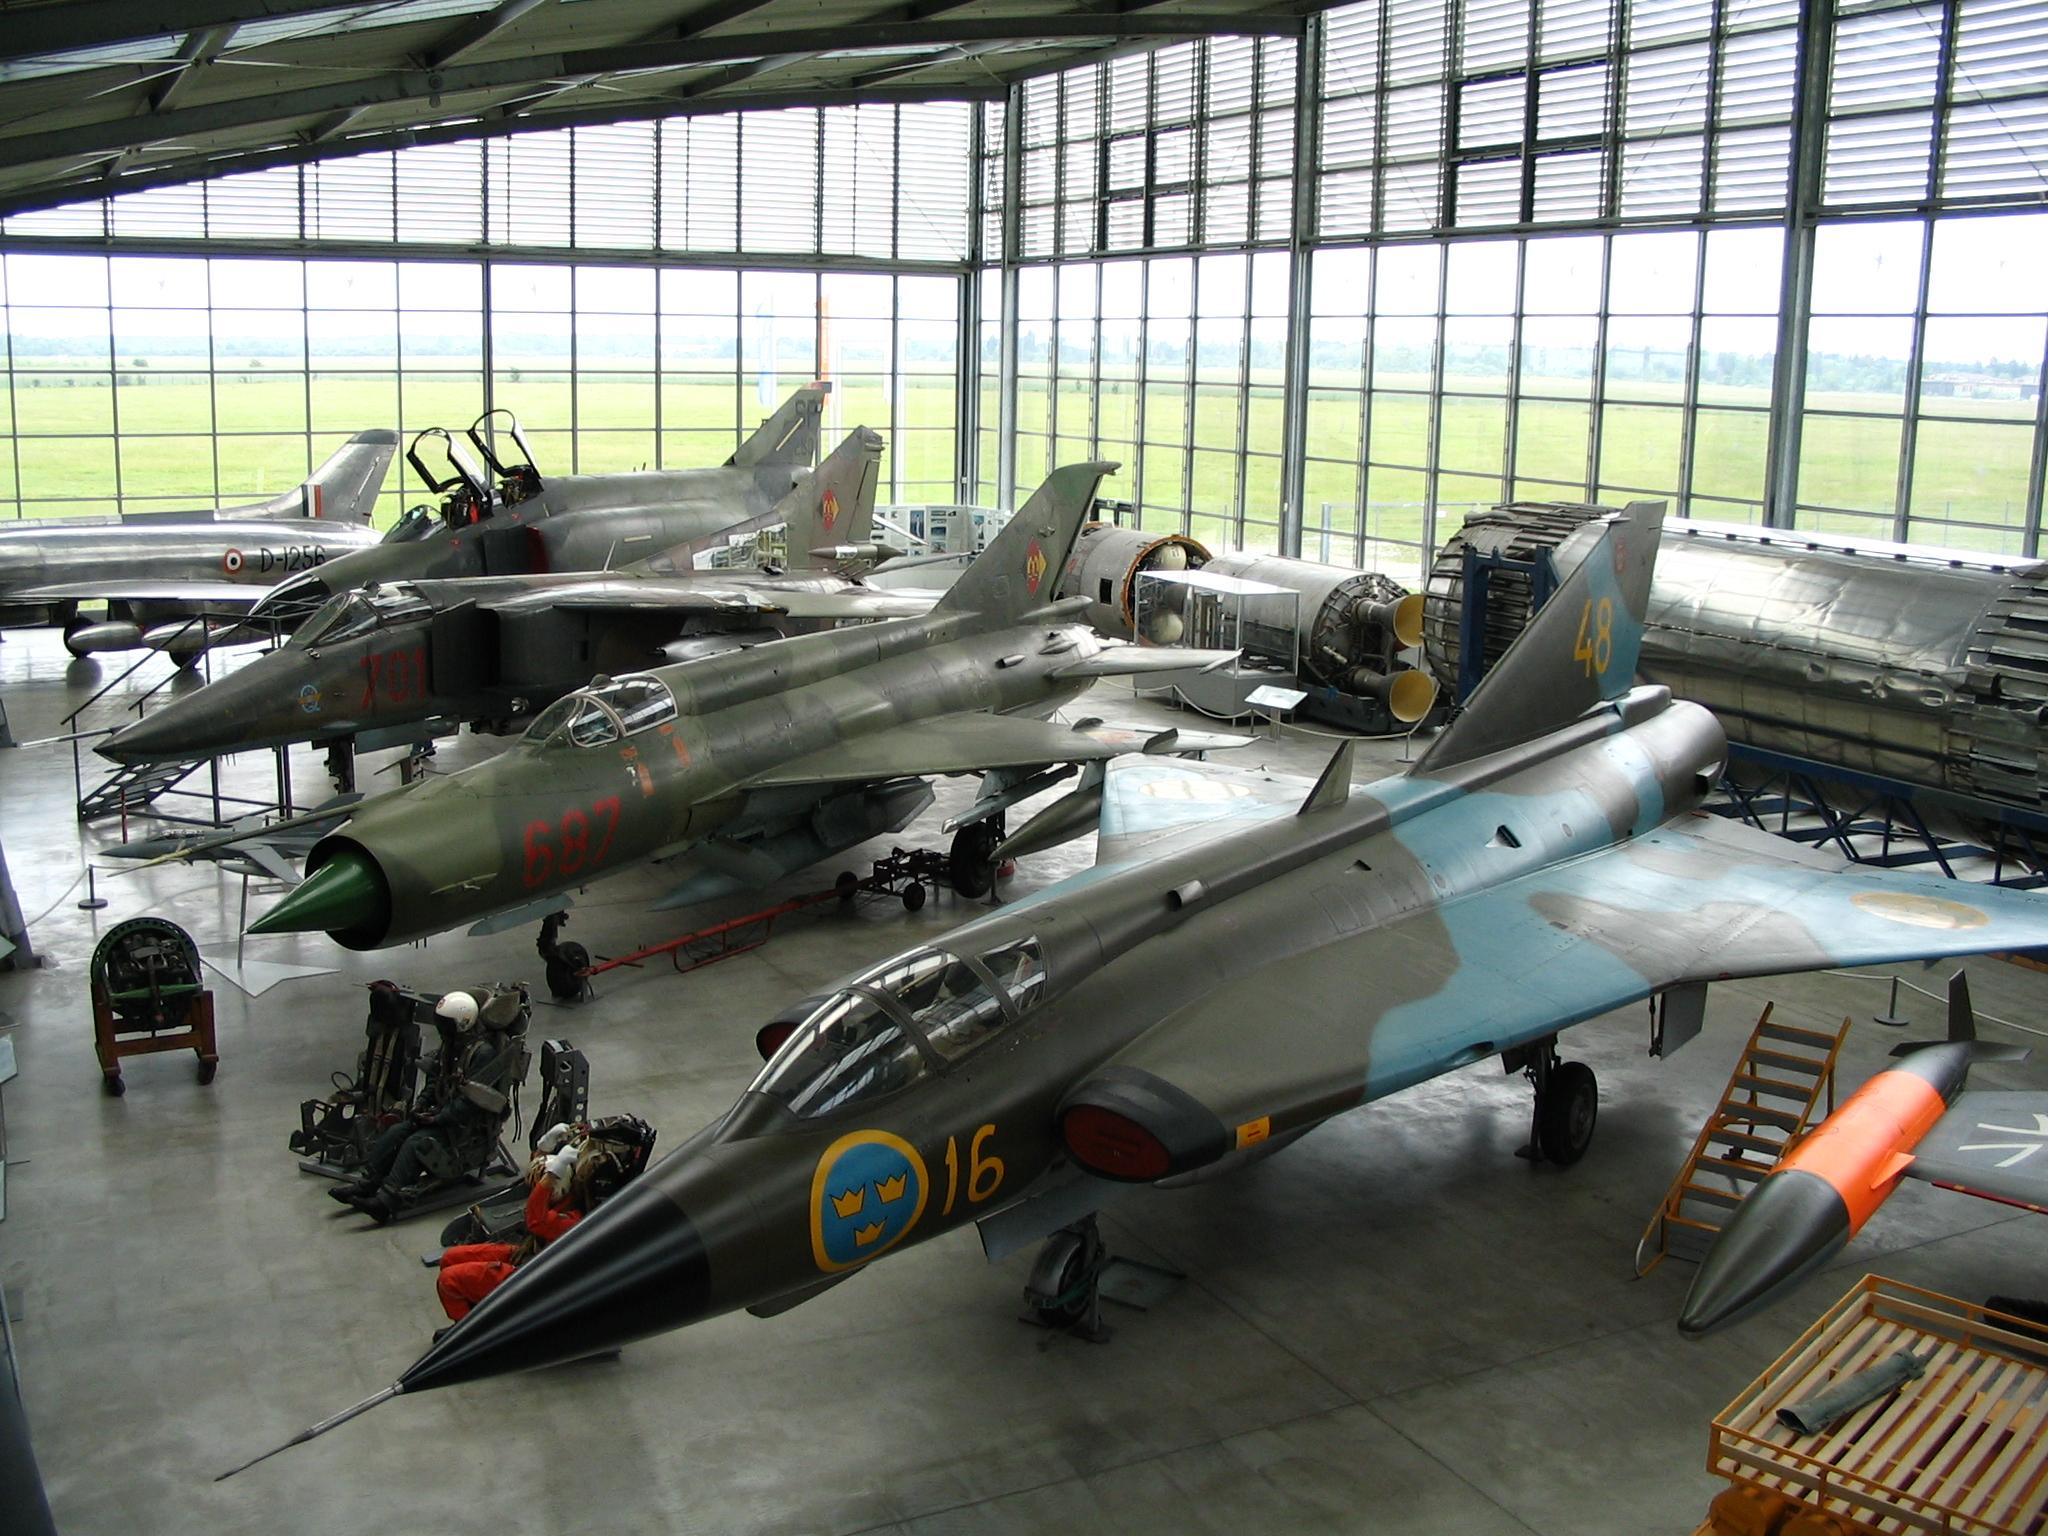 Flugzeugmuseum Stuttgart